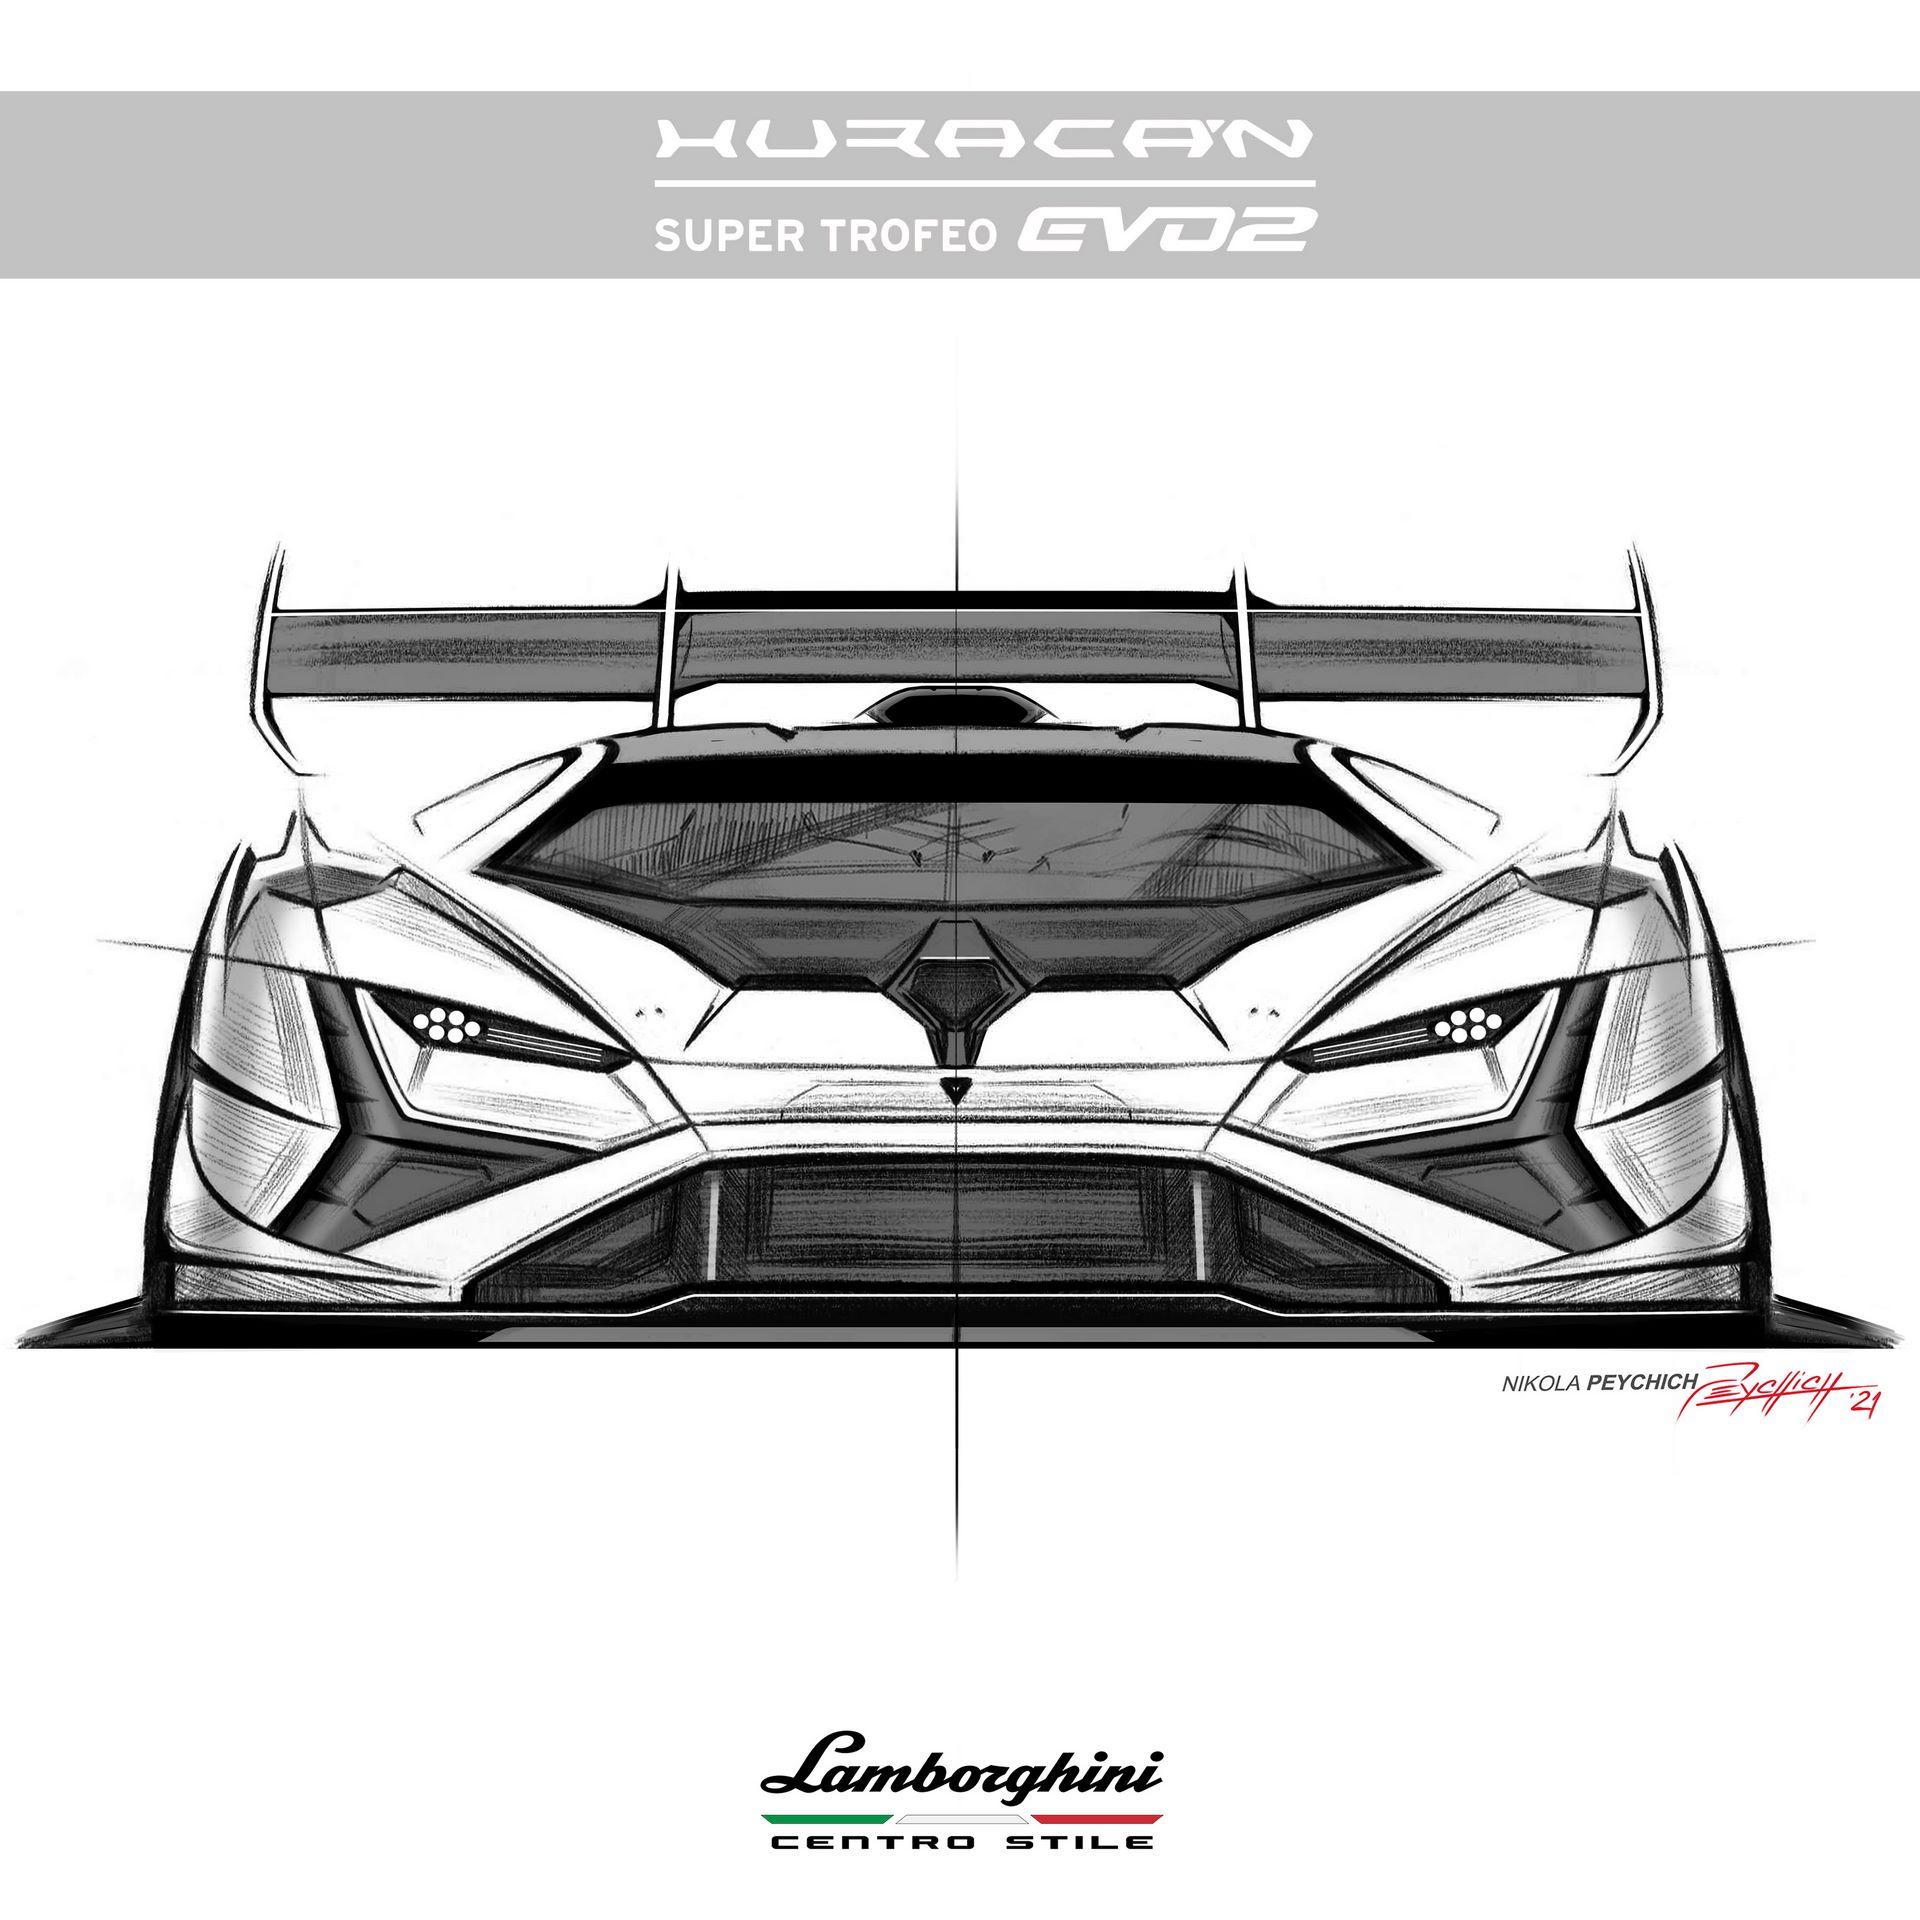 Lamborghini-Huracan-Super-Trofeo-EVO2-16